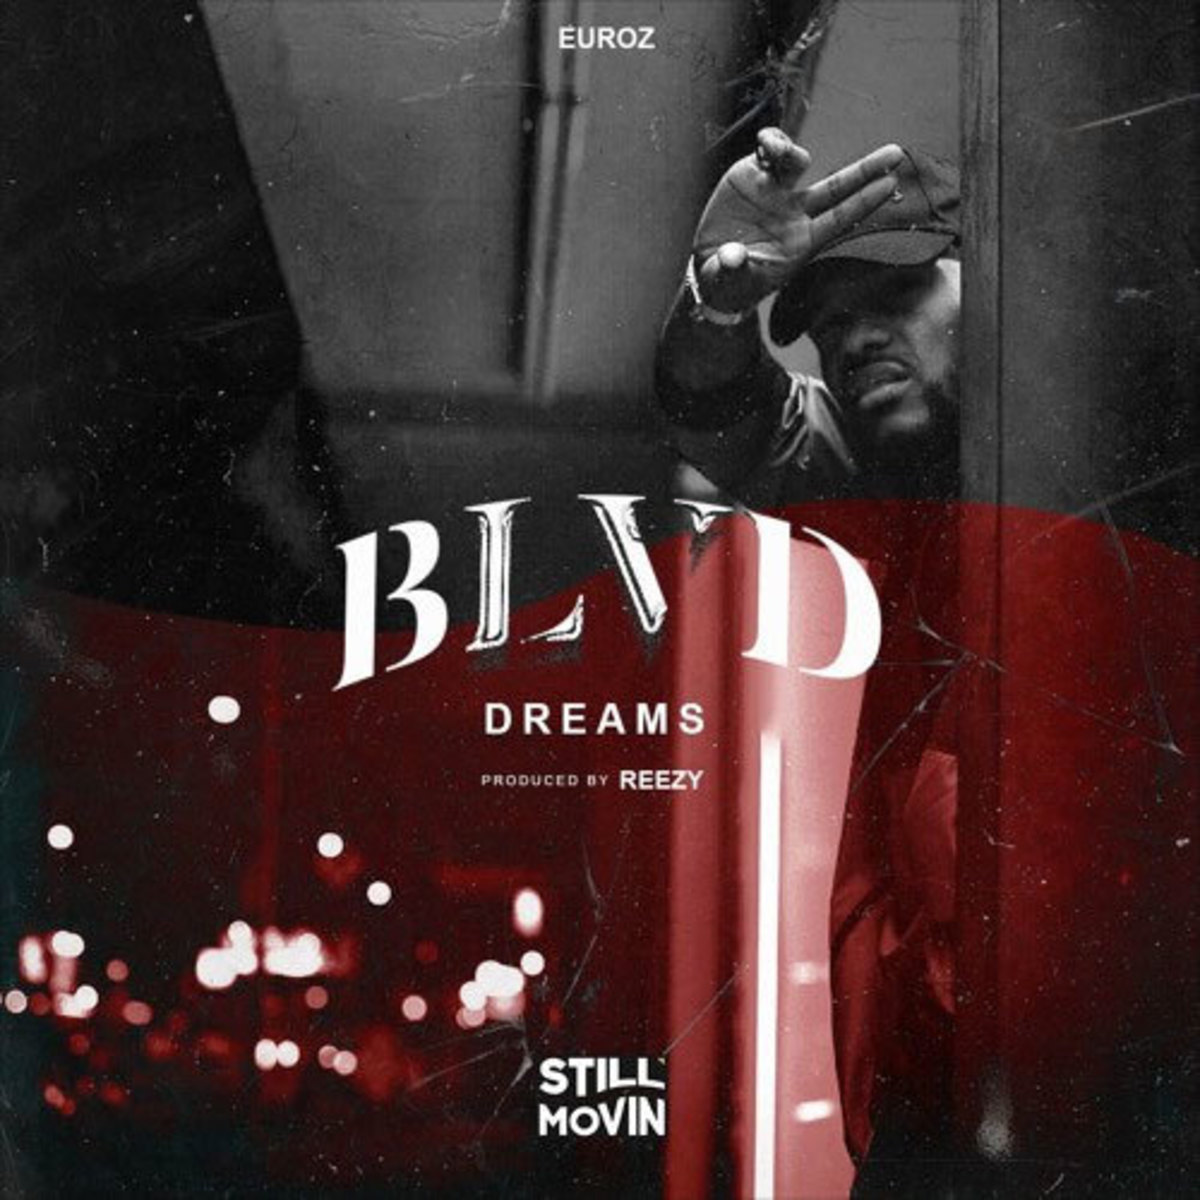 euroz-blvd-dreams.jpg